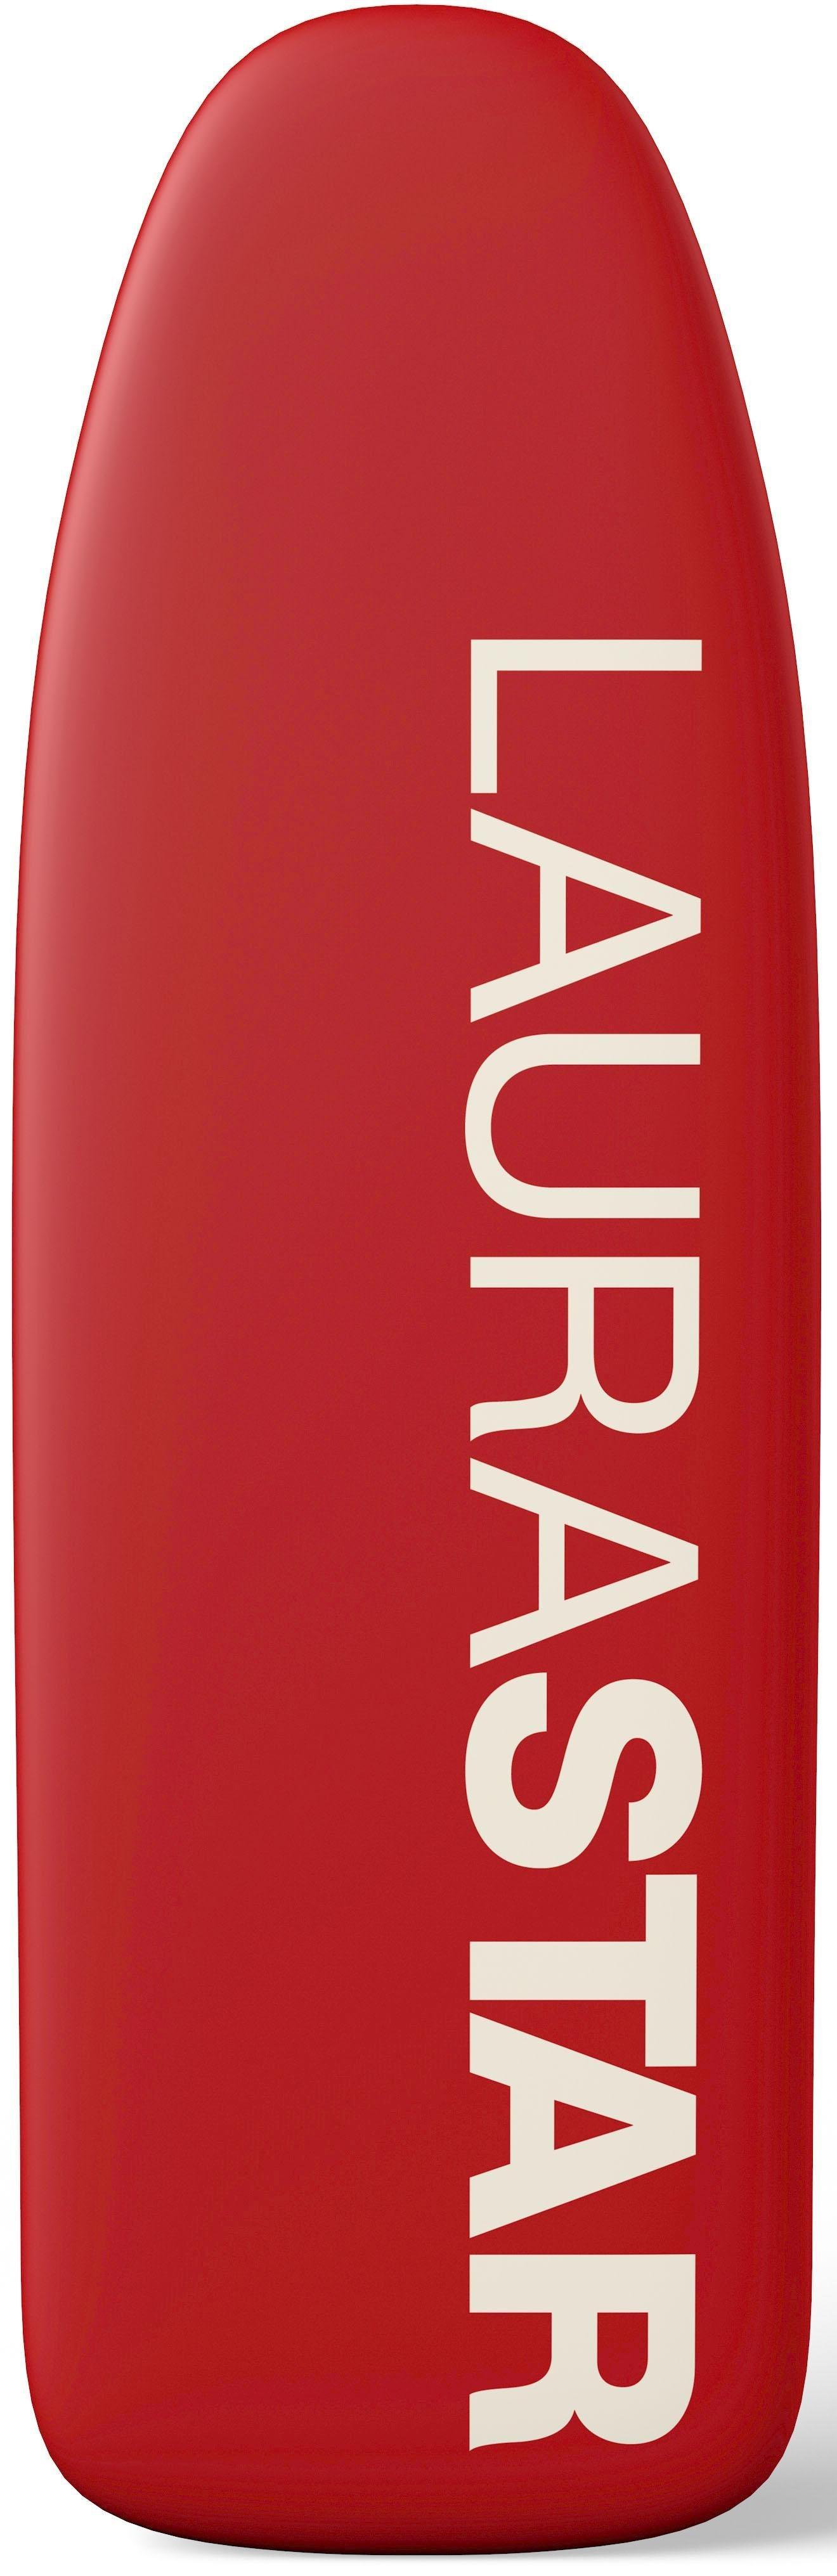 Laura-star Bügelbezug Mycover, rot